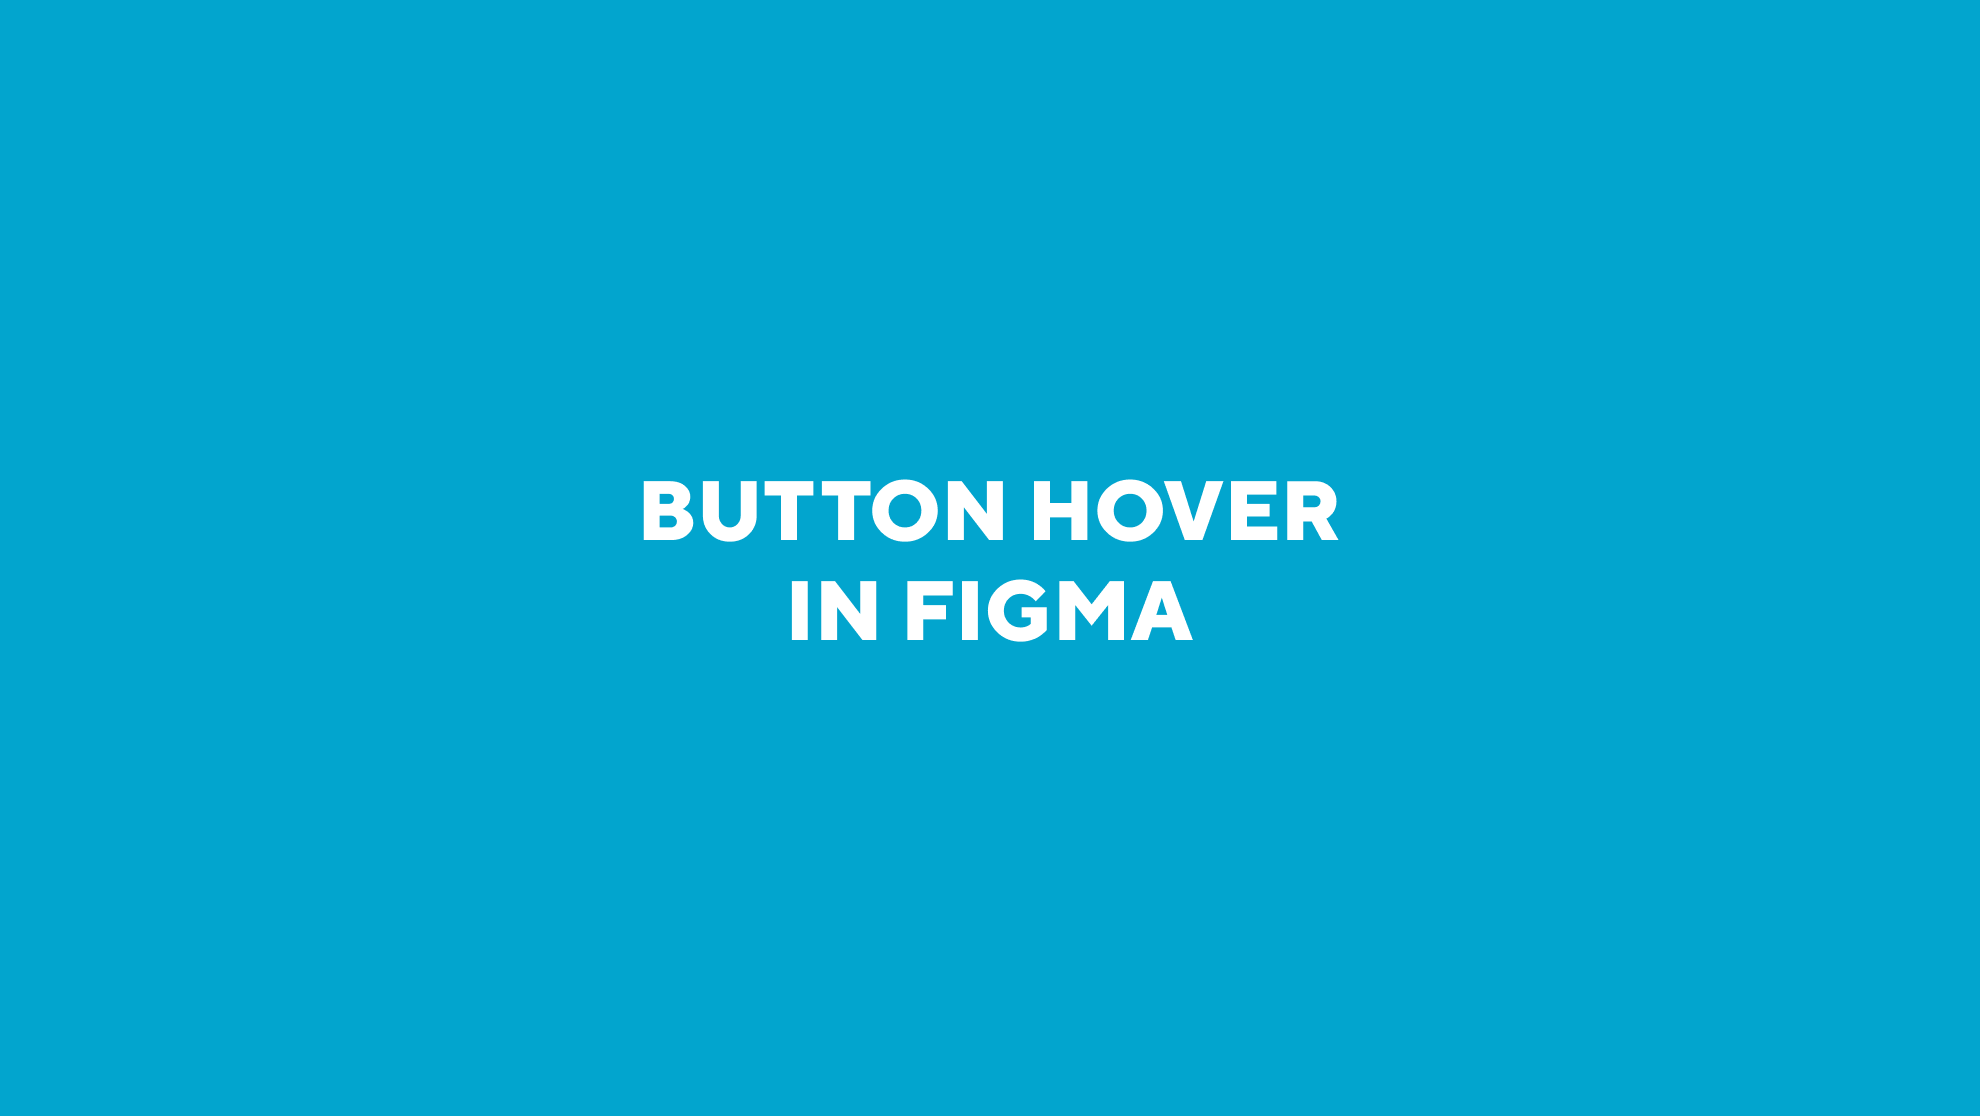 Button hover in figma